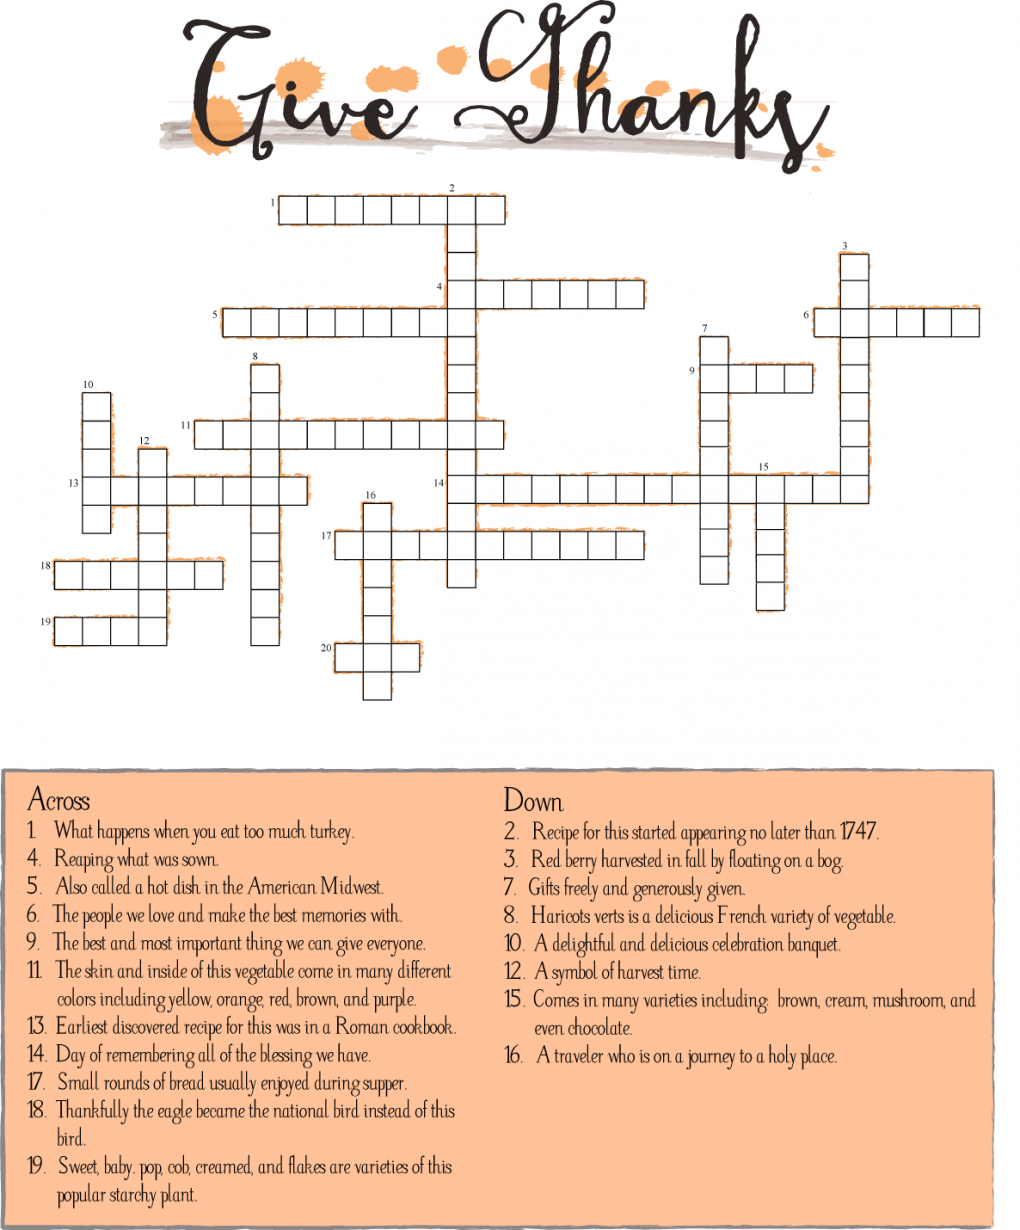 10 Superfun Thanksgiving Crossword Puzzles | Kittybabylove - Printable Thanksgiving Crossword Puzzles For Adults